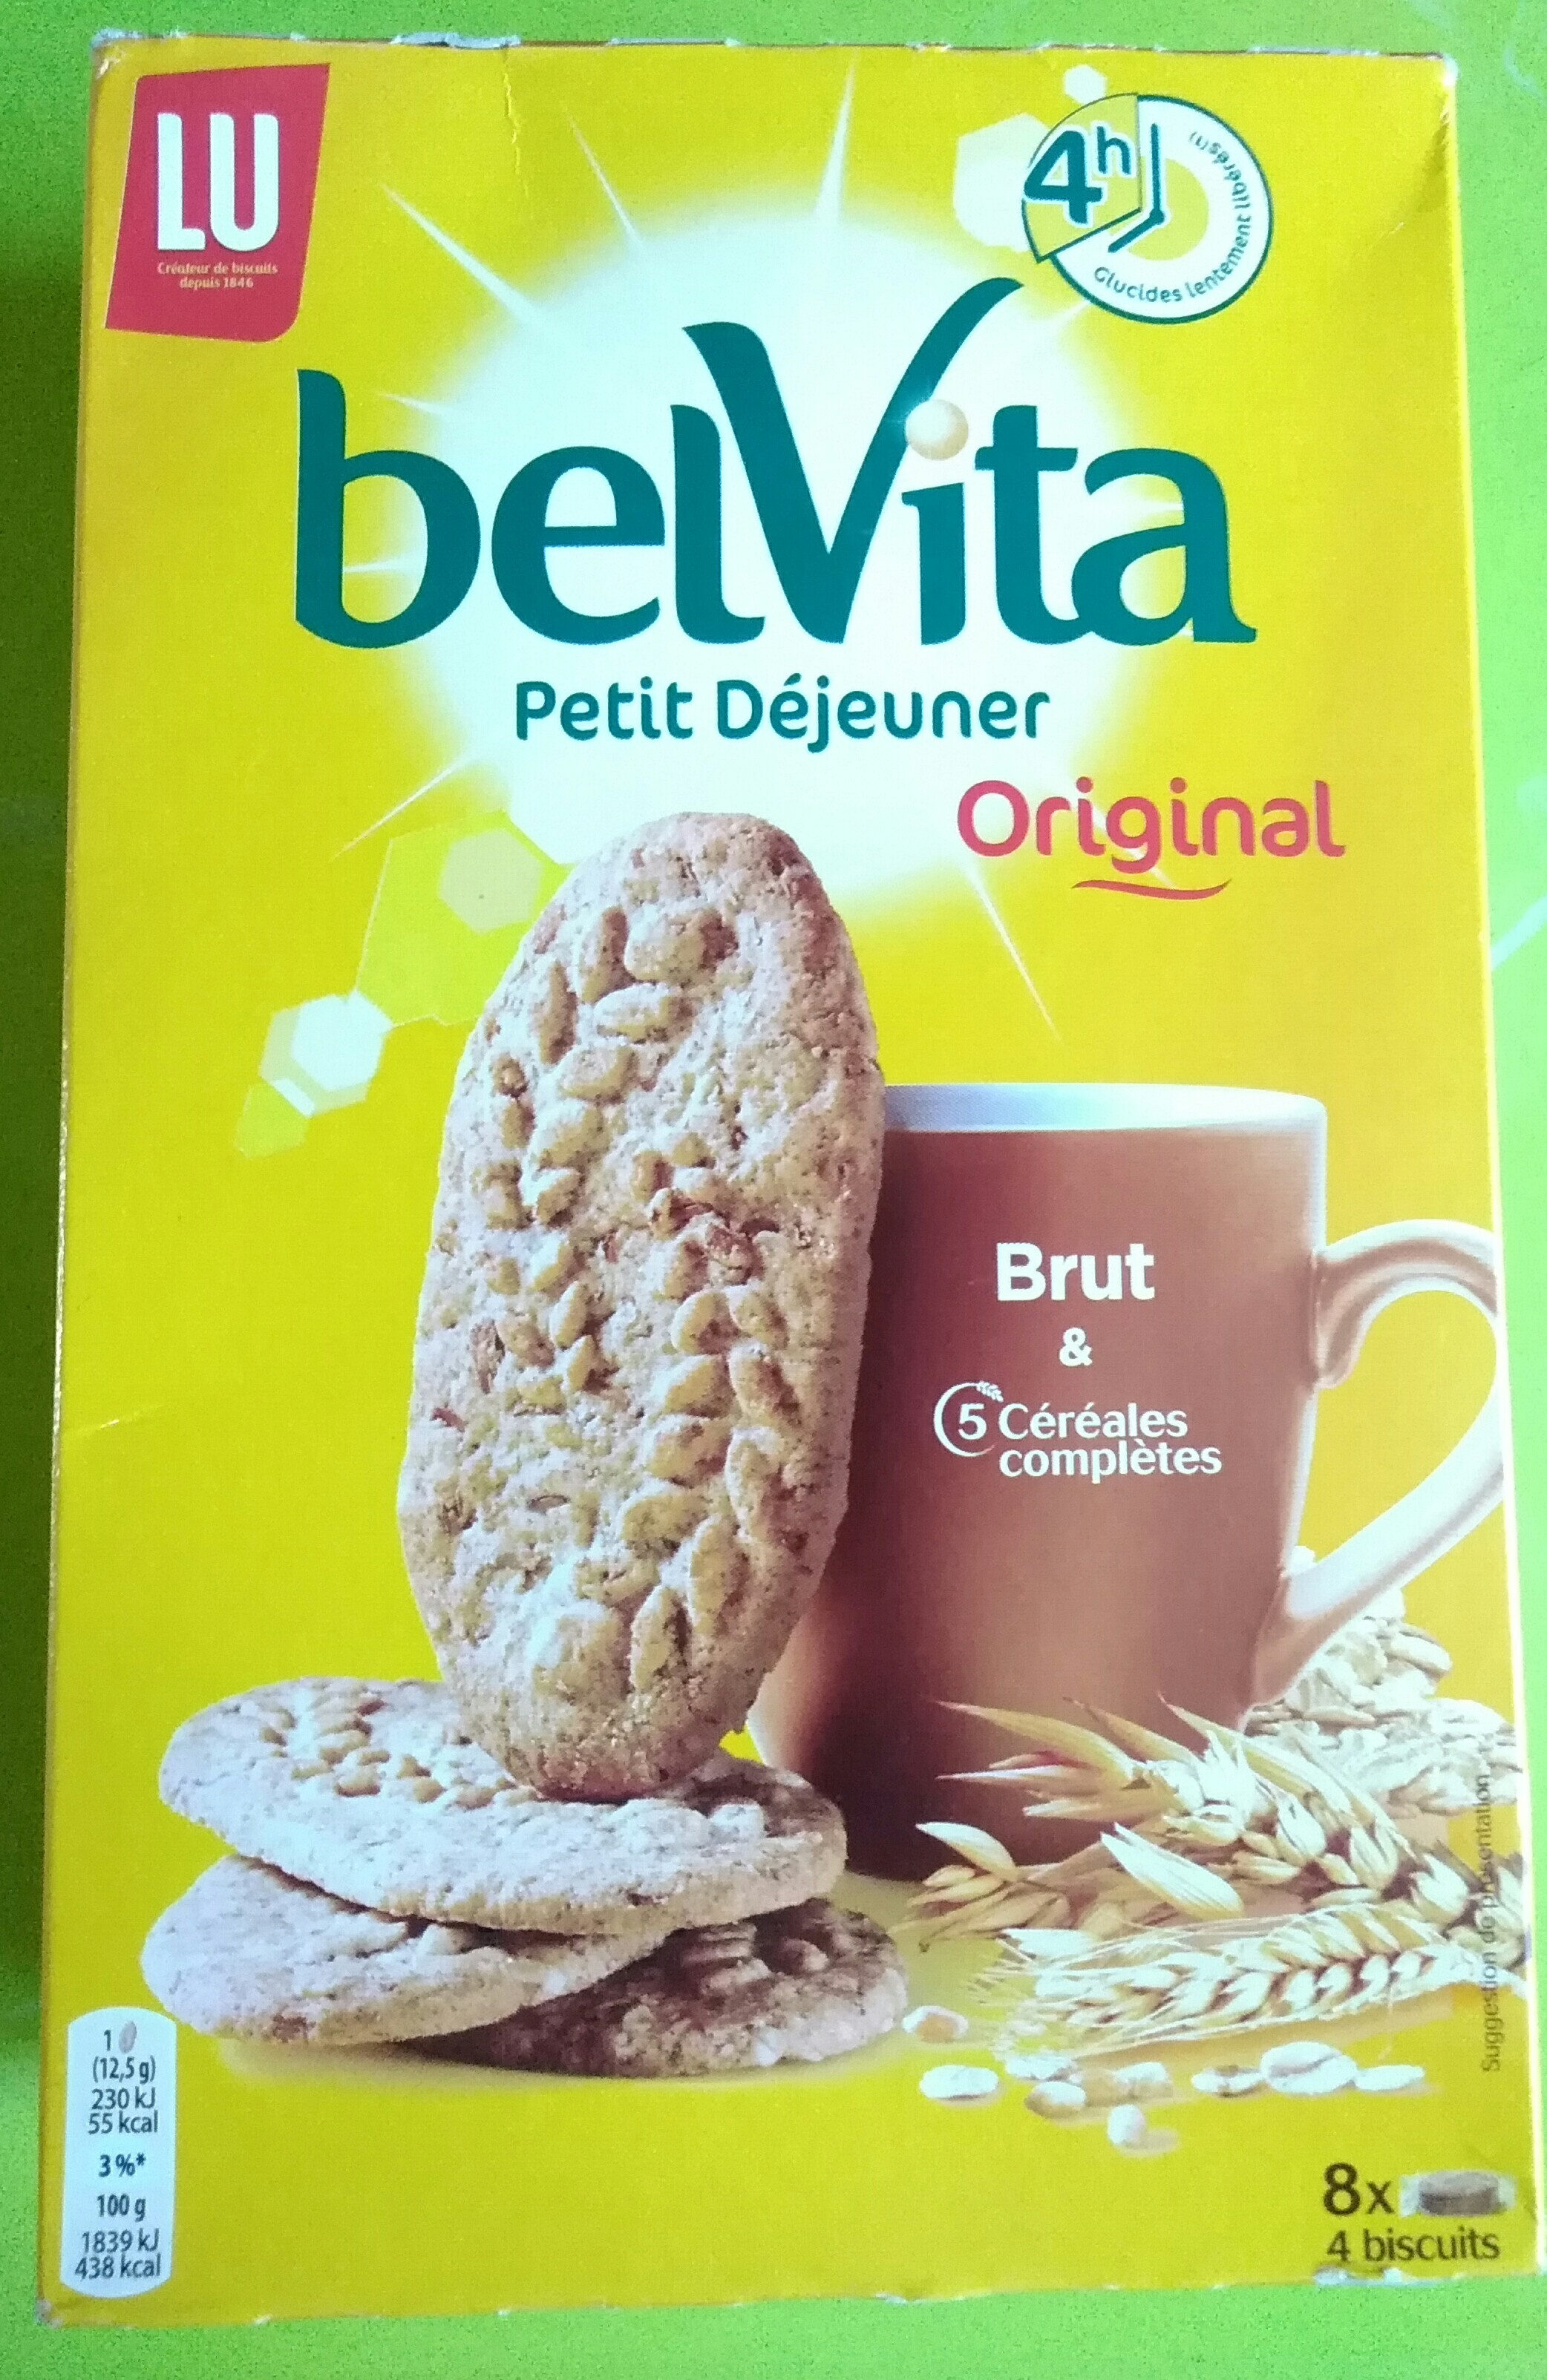 belvita original petit dejeuner - Product - fr